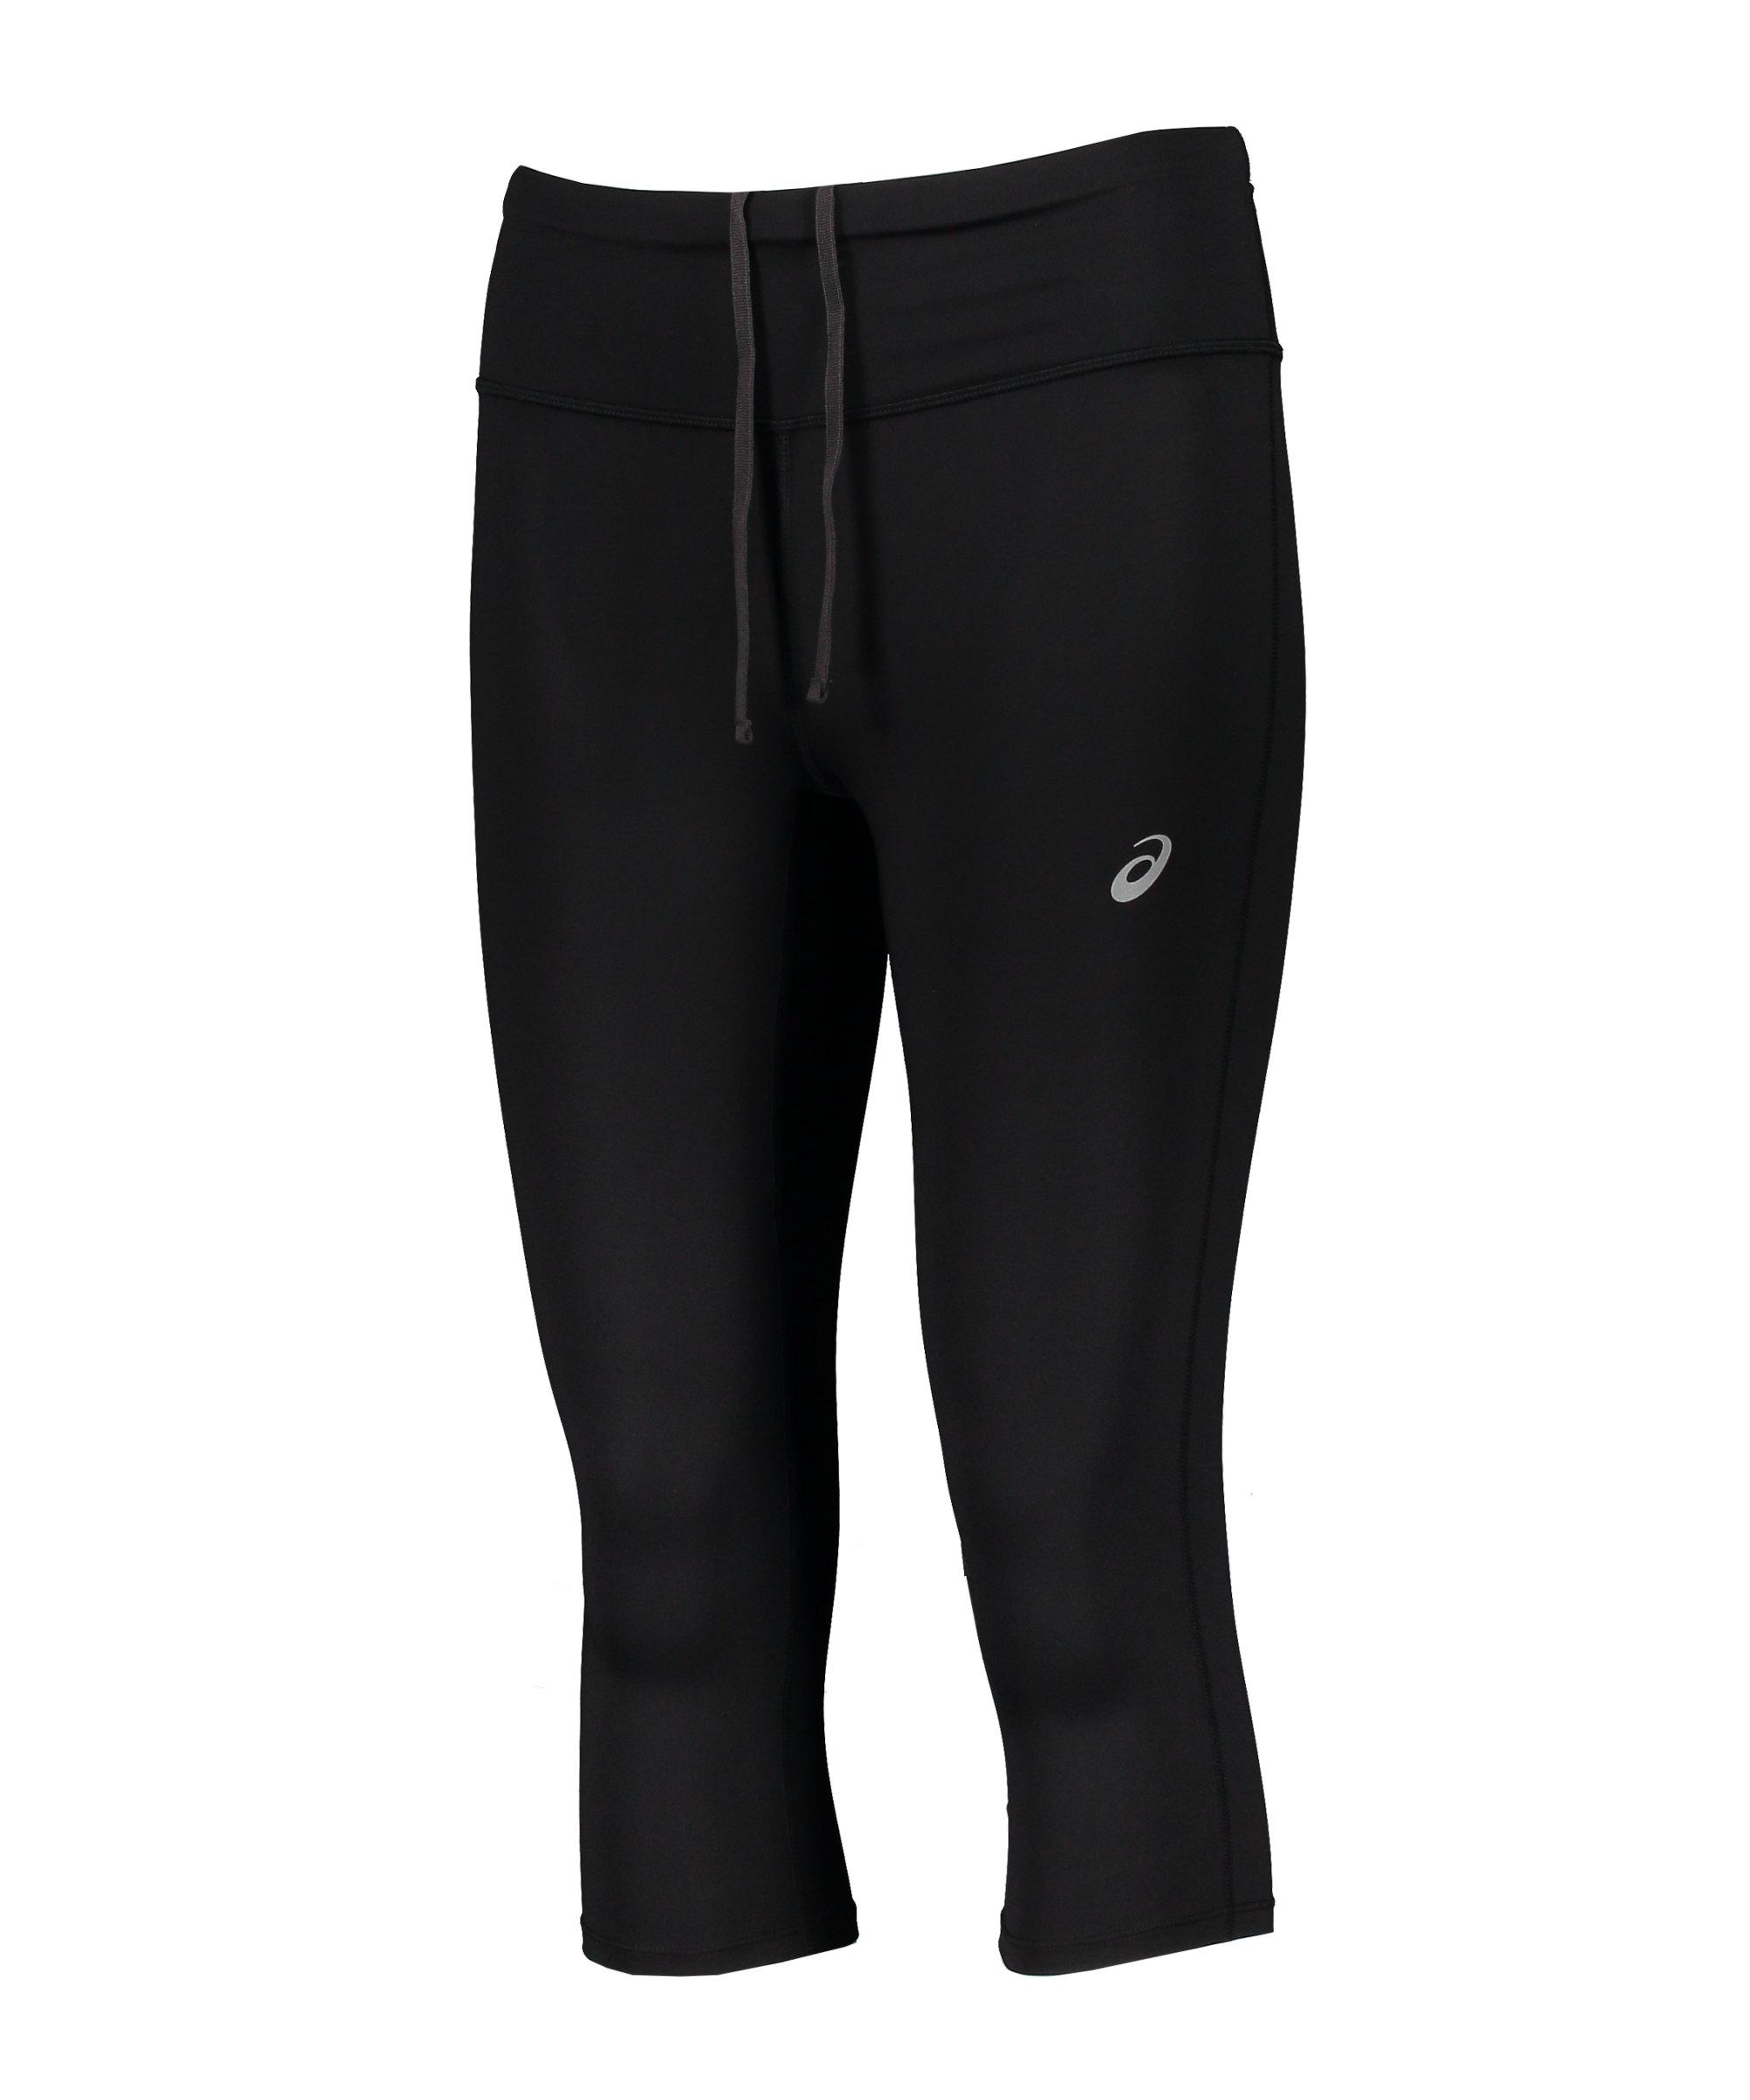 Asics Core Capri Leggings Running Damen F001 - schwarz